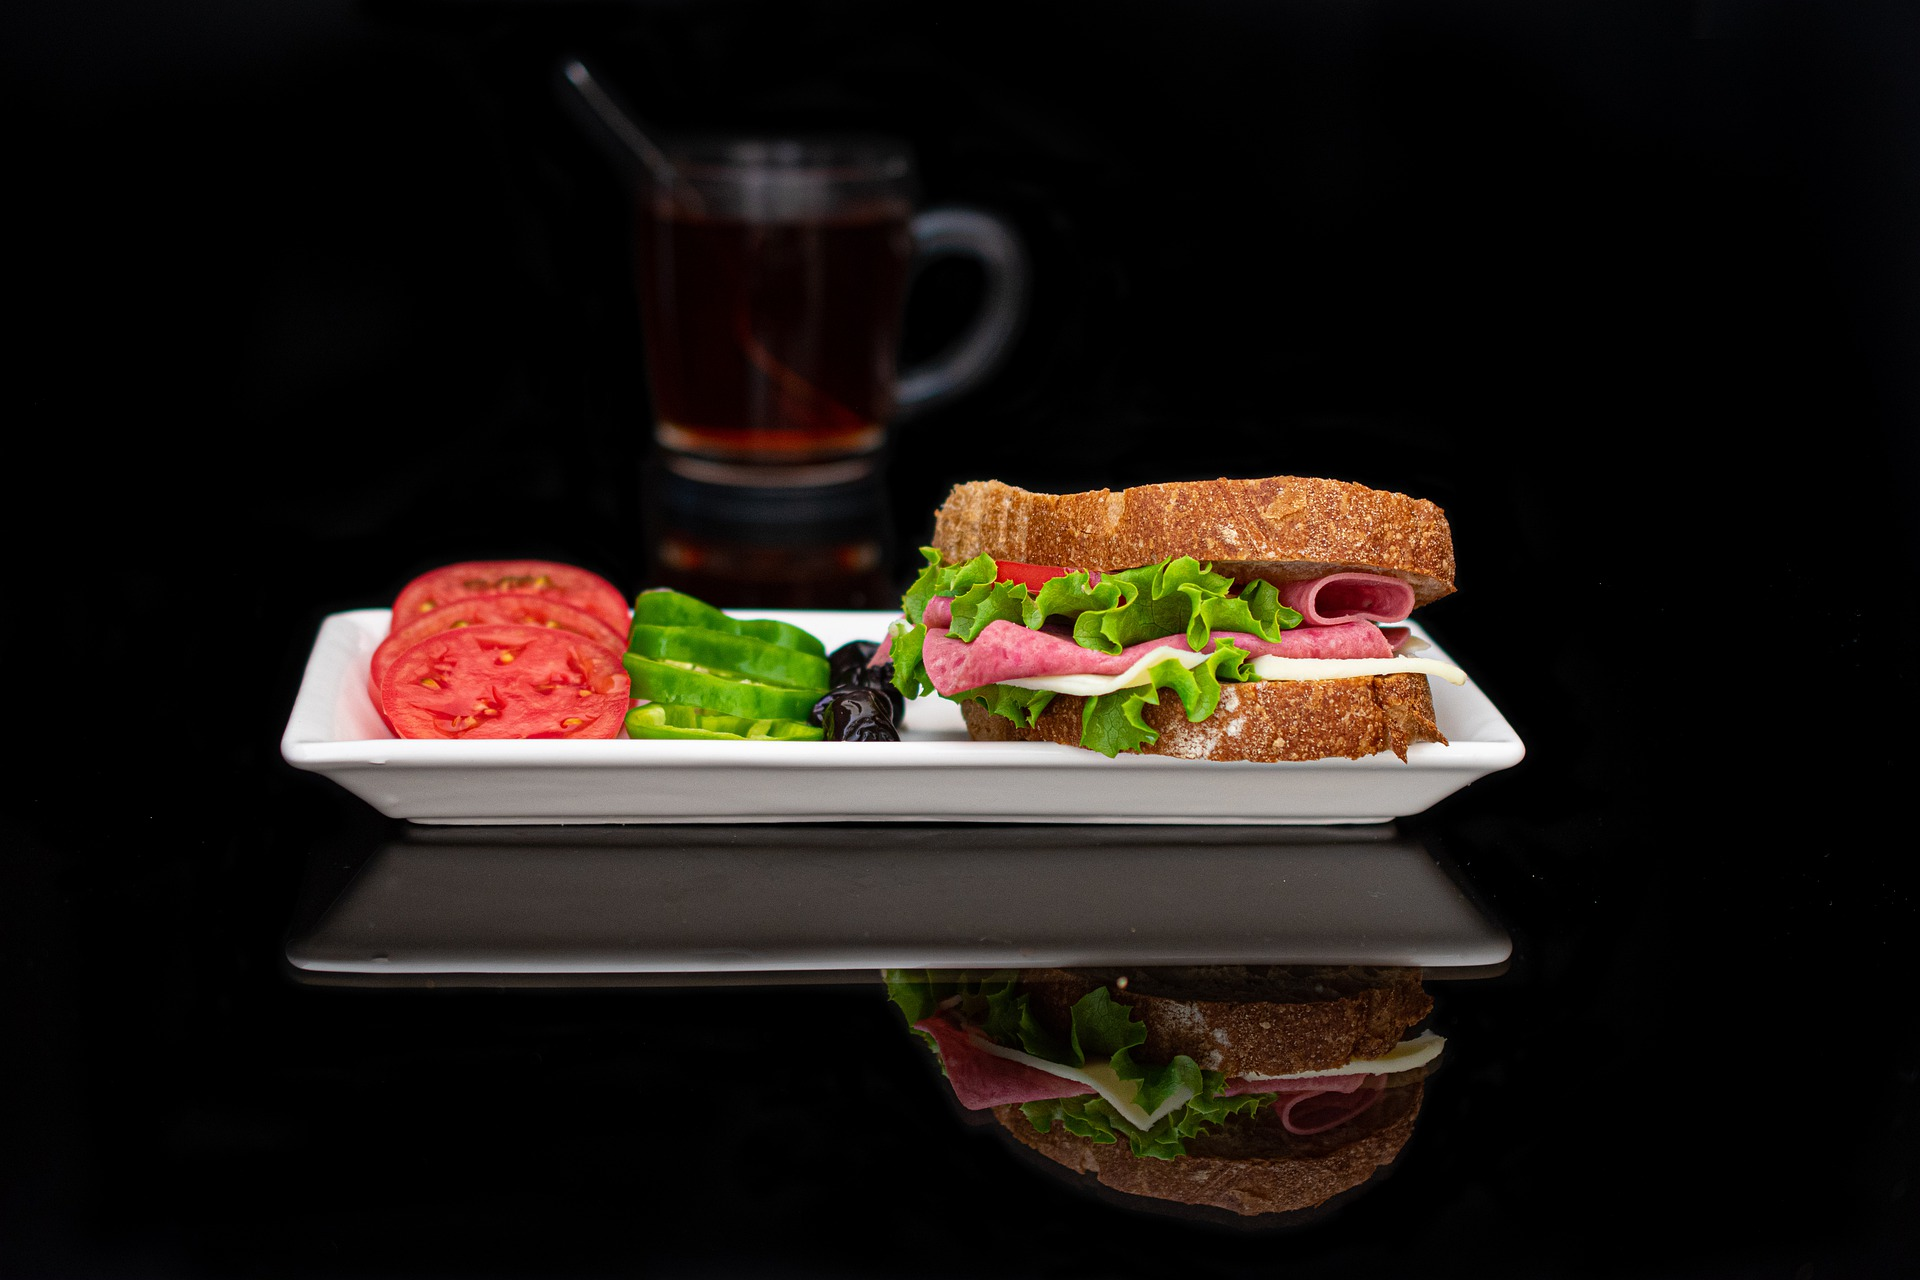 La Food Photography #1